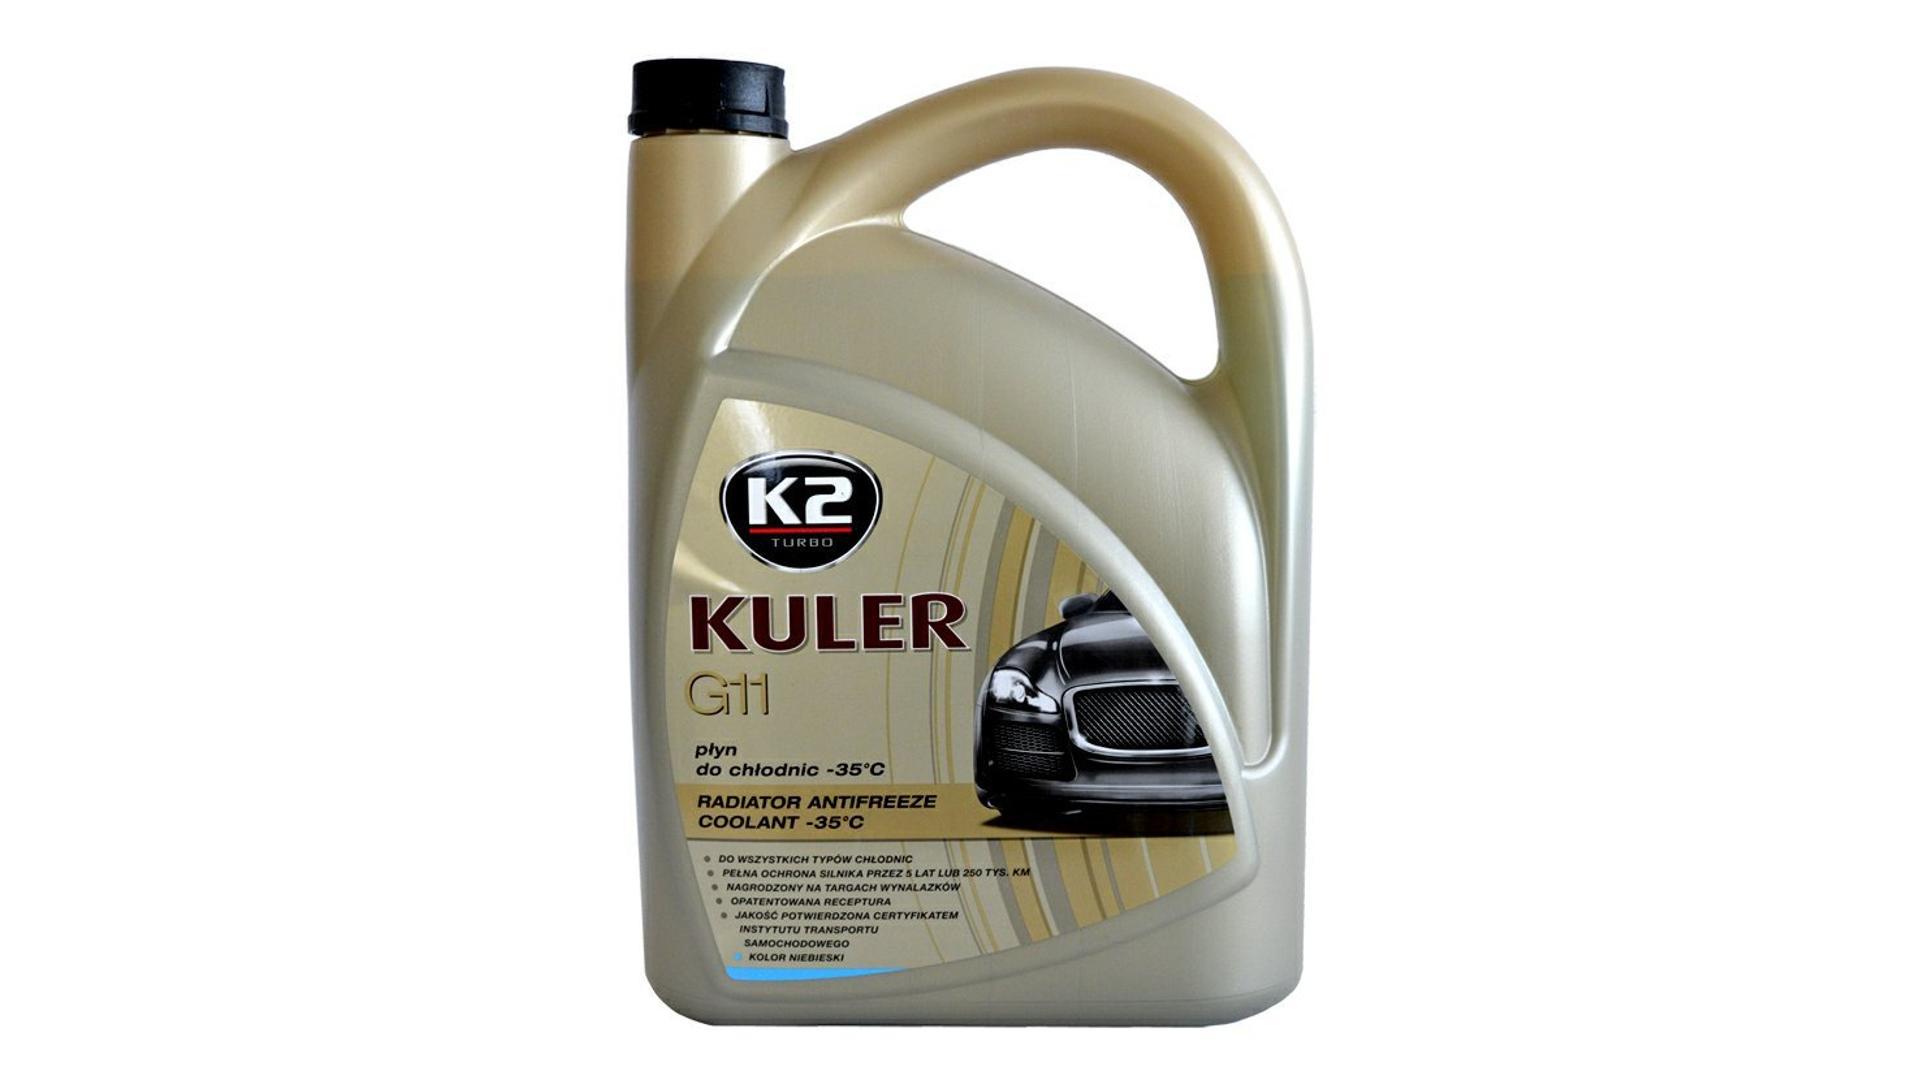 K2 Kuler G11 MODRÁ 5 l - nemrznúca kvapalina do chladiča do -35 ° C